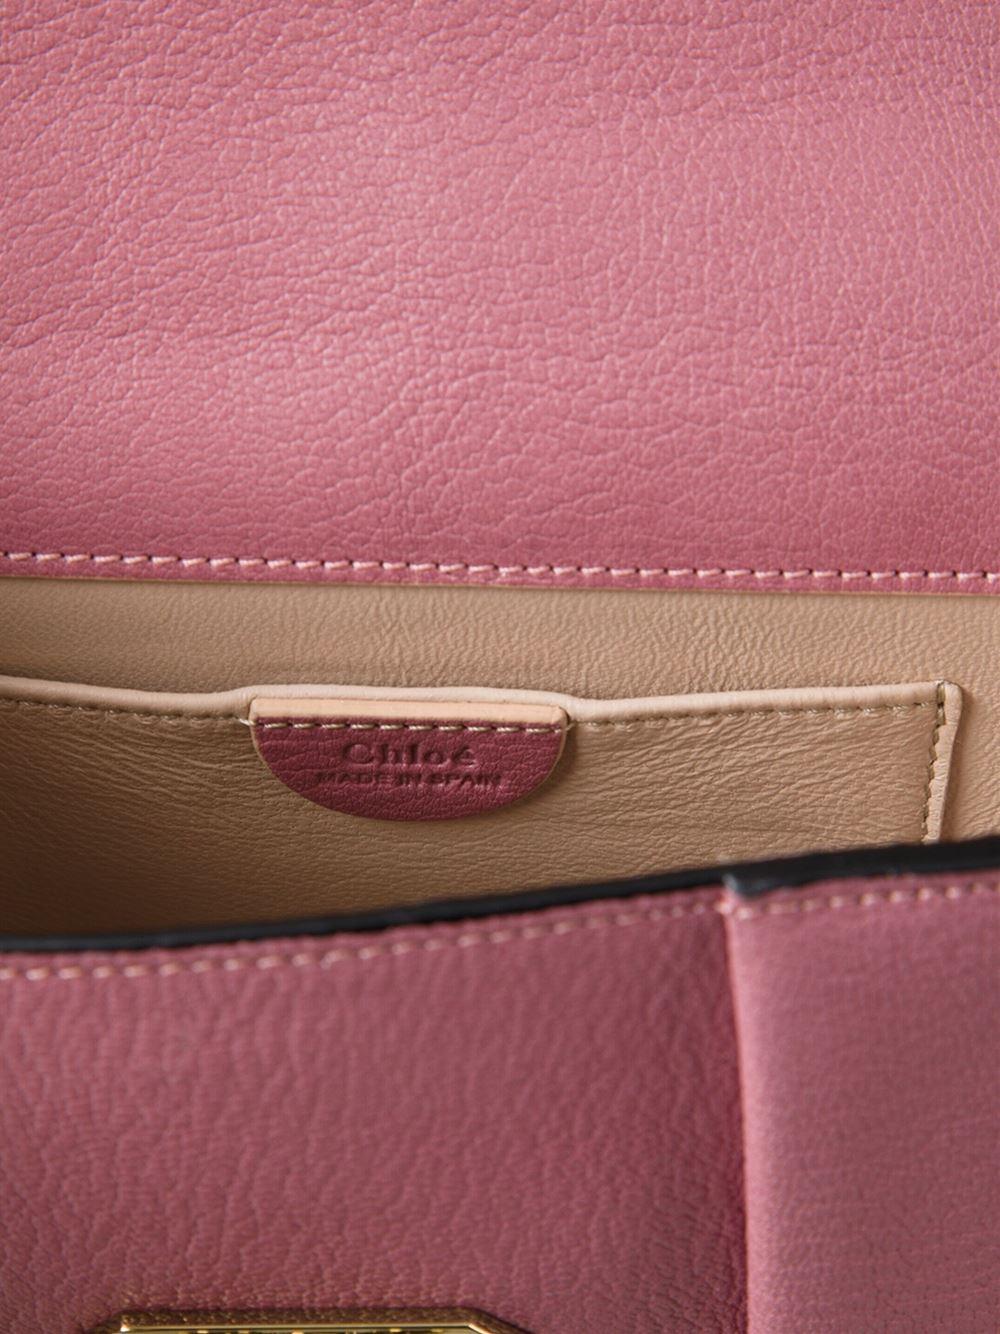 chloe imitation - chloe embellished elsie clutch, wholesale chloe bags